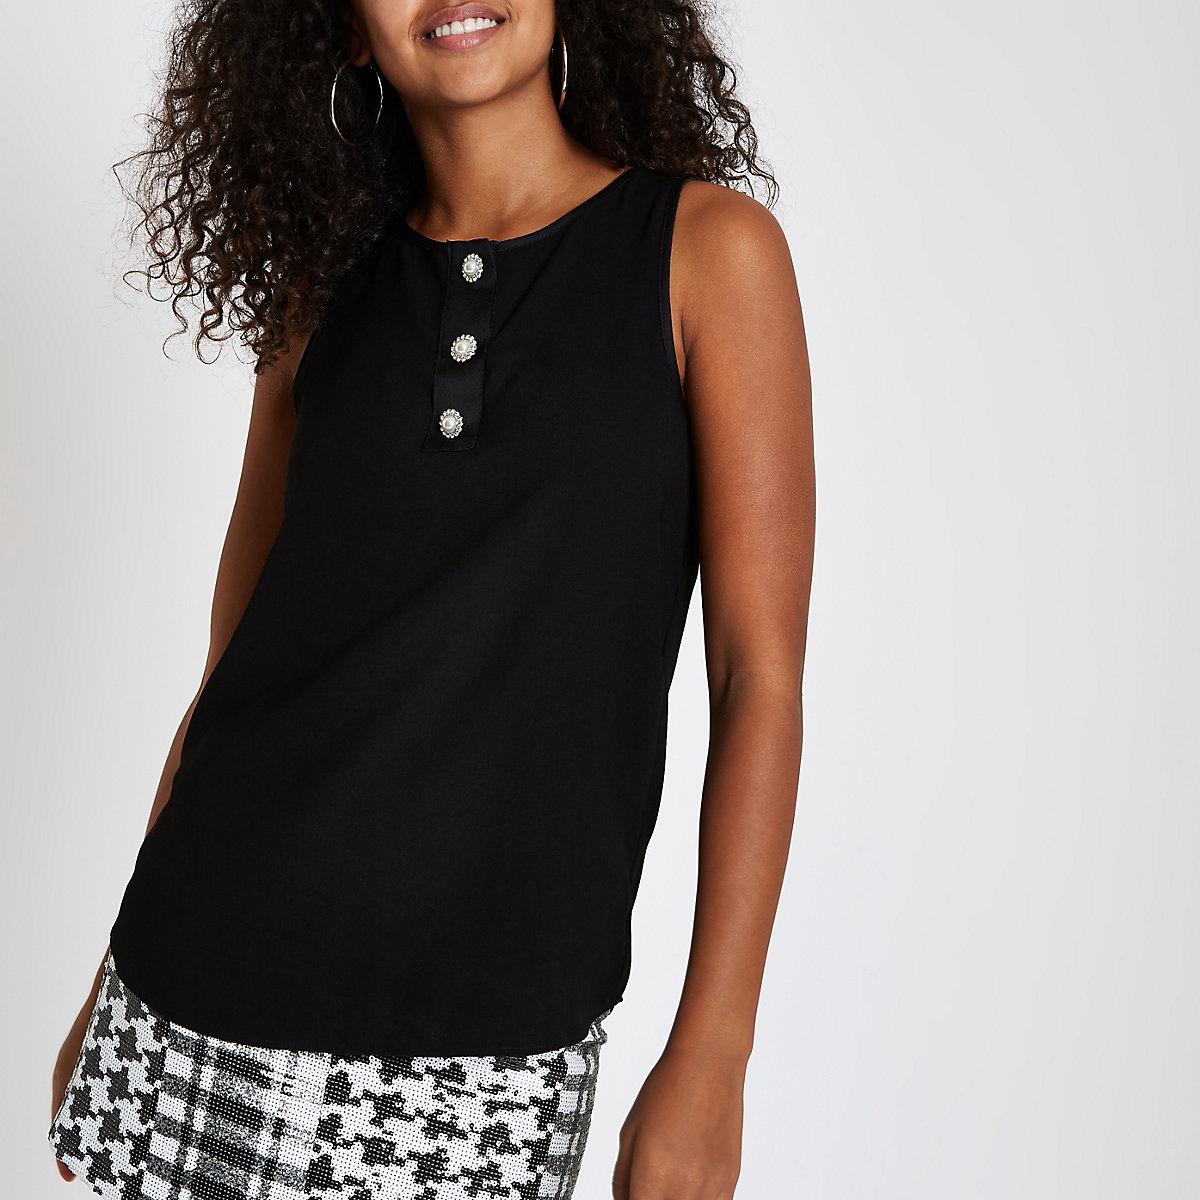 Black pearl rhinestone button sleeveless top